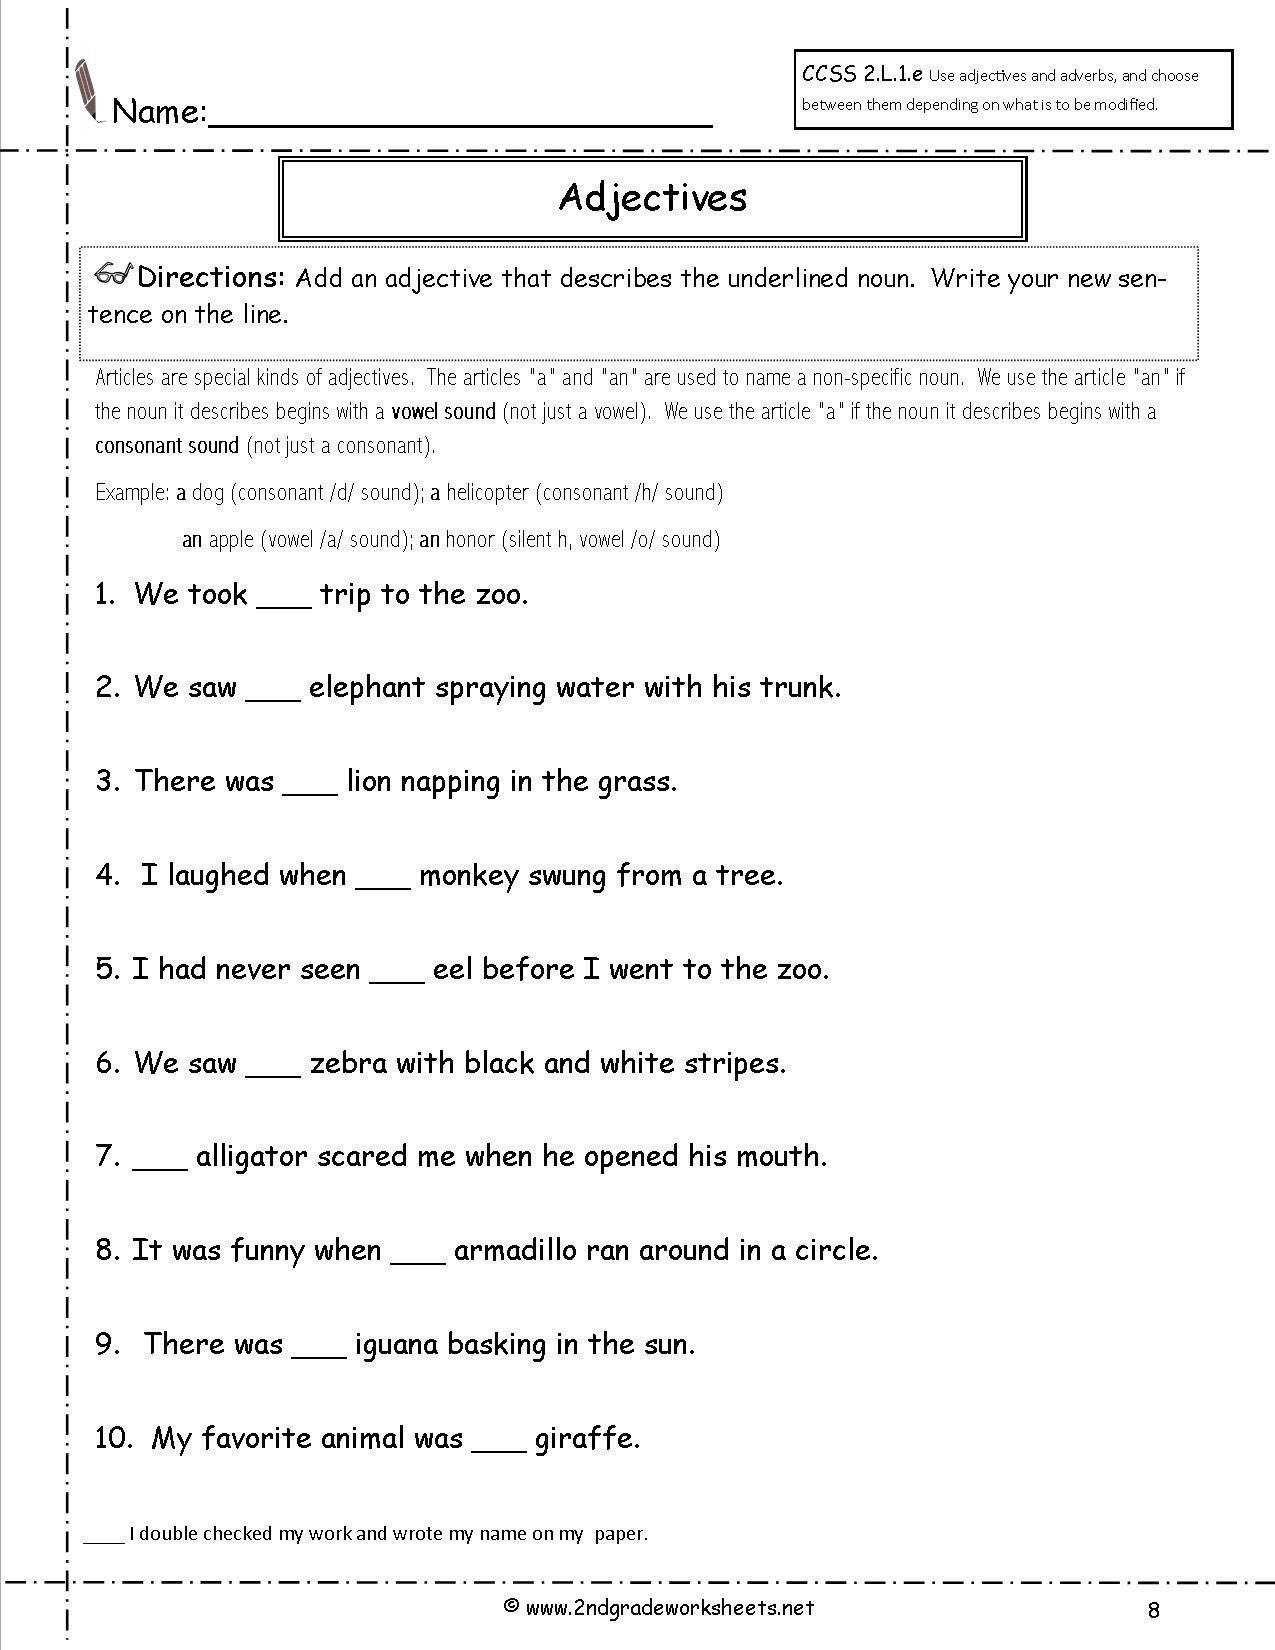 Third Grade Grammar Worksheet Worksheet For 3rd Grade Grammar In 2020 2nd Grade Worksheets Grammar Worksheets Third Grade Grammar Worksheets